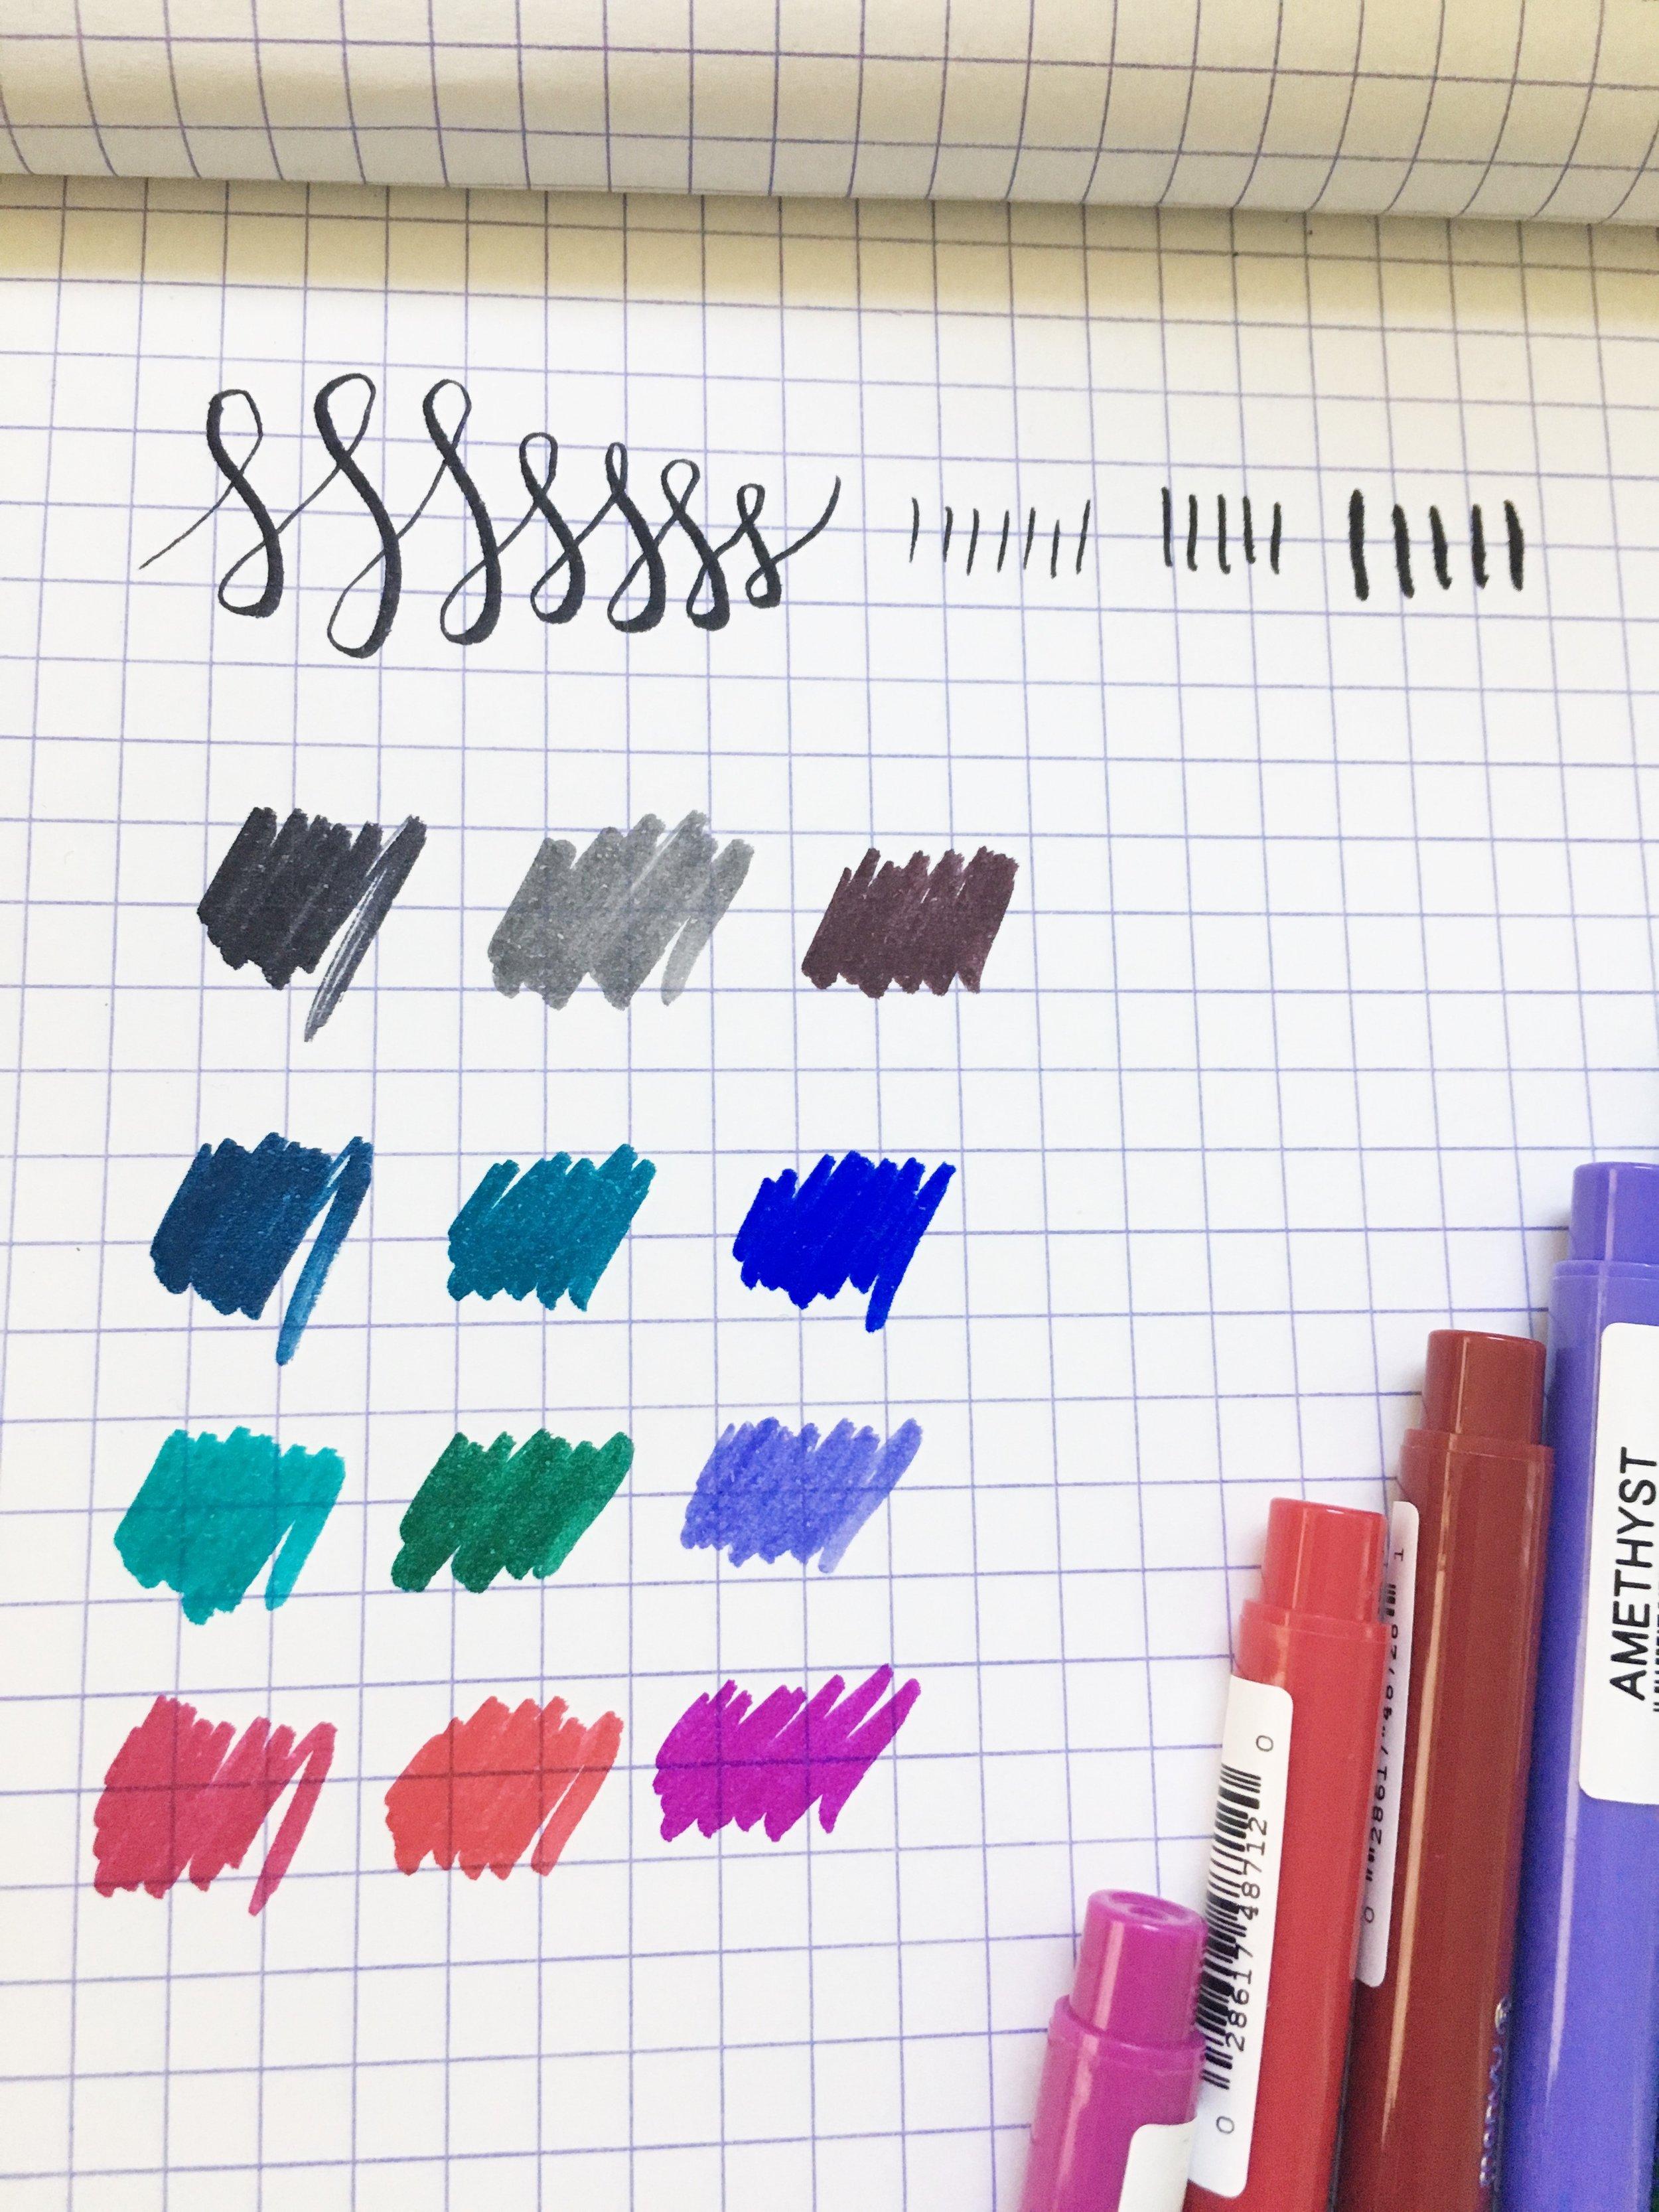 Marvy Le Pen Flex Brush Pen Writing